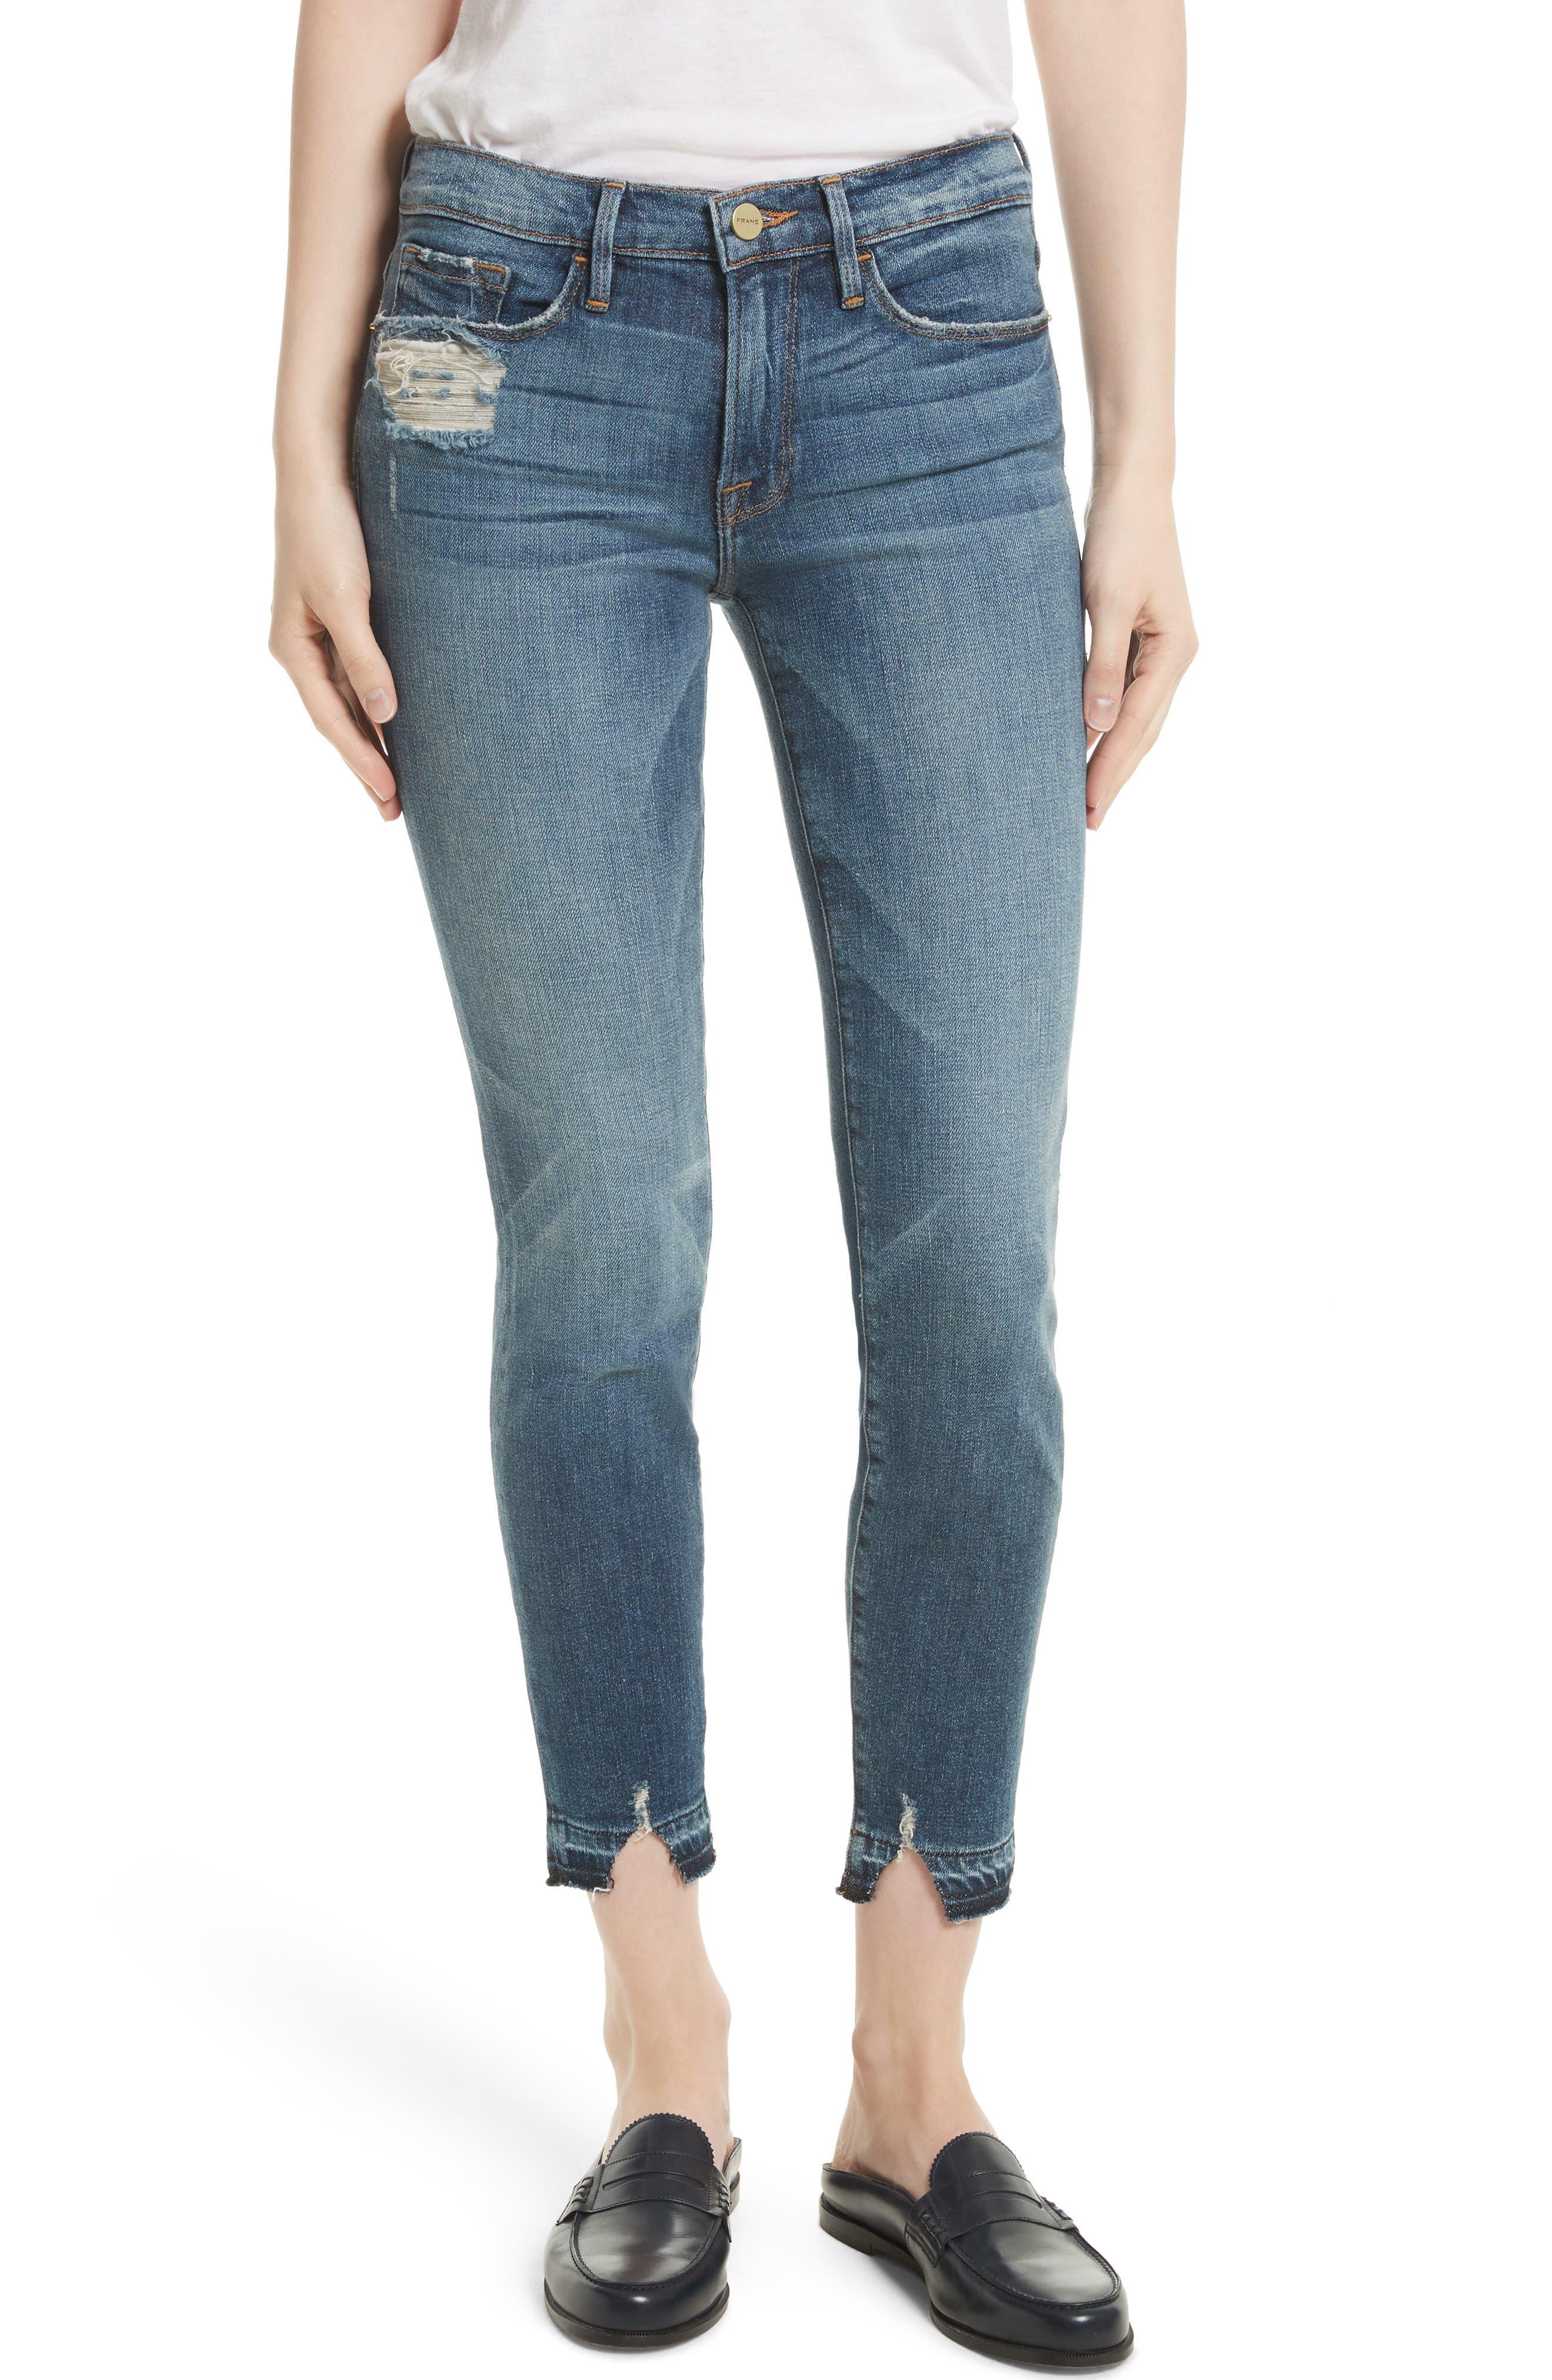 Main Image - FRAME Le Skinny de Jeanne Crop Release Hem Jeans (Roberts) (Nordstrom Exclusive)